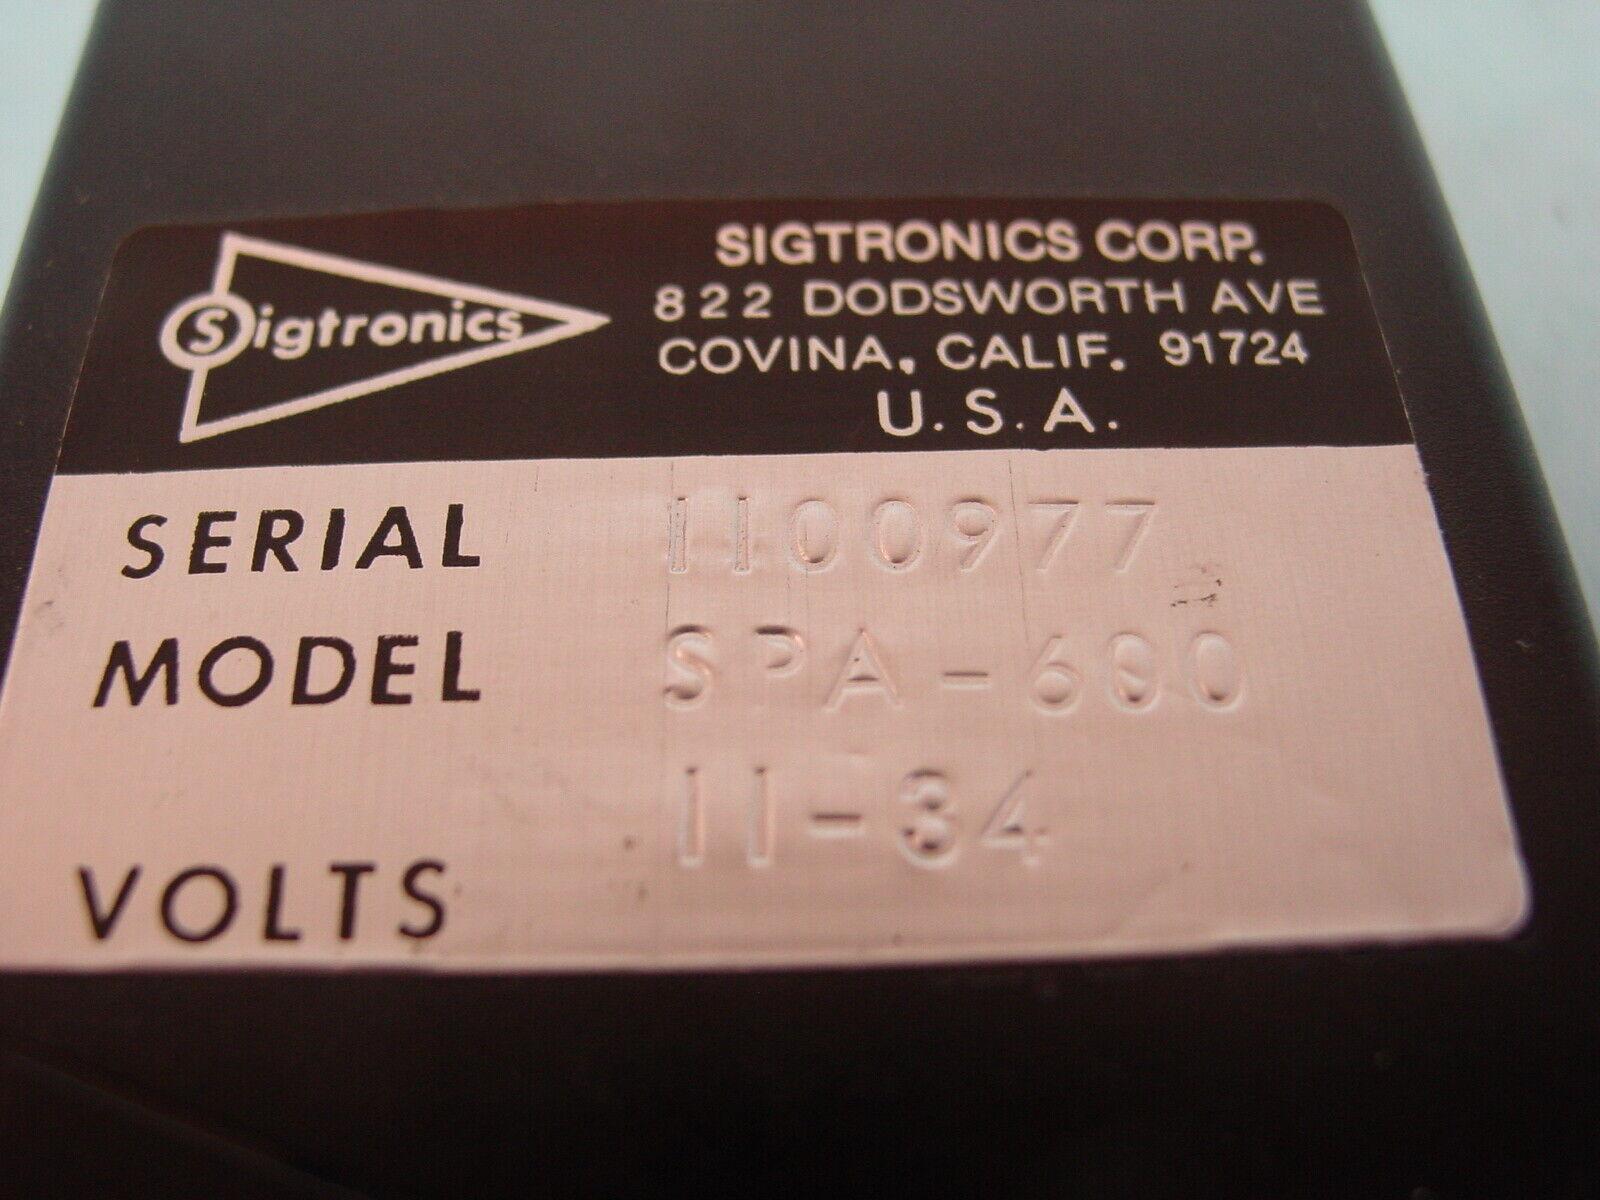 Sigtronics SPA-600 Panel Mounted Intercom (Volts: 12/24)